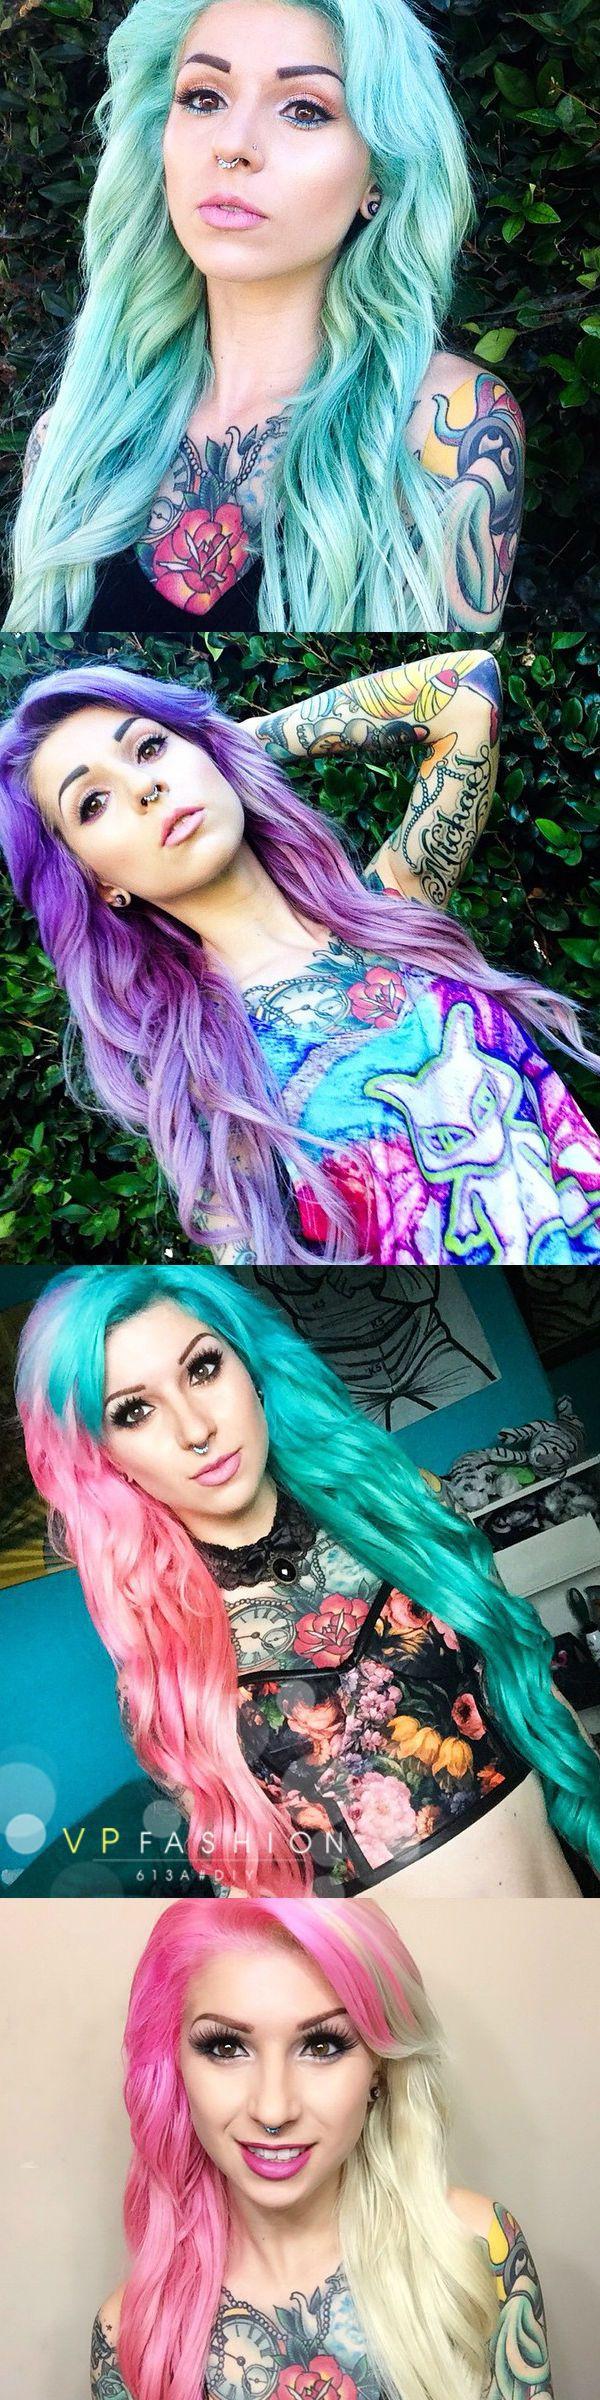 Airica michelle colorful hair color show with vpfashion blonde diy